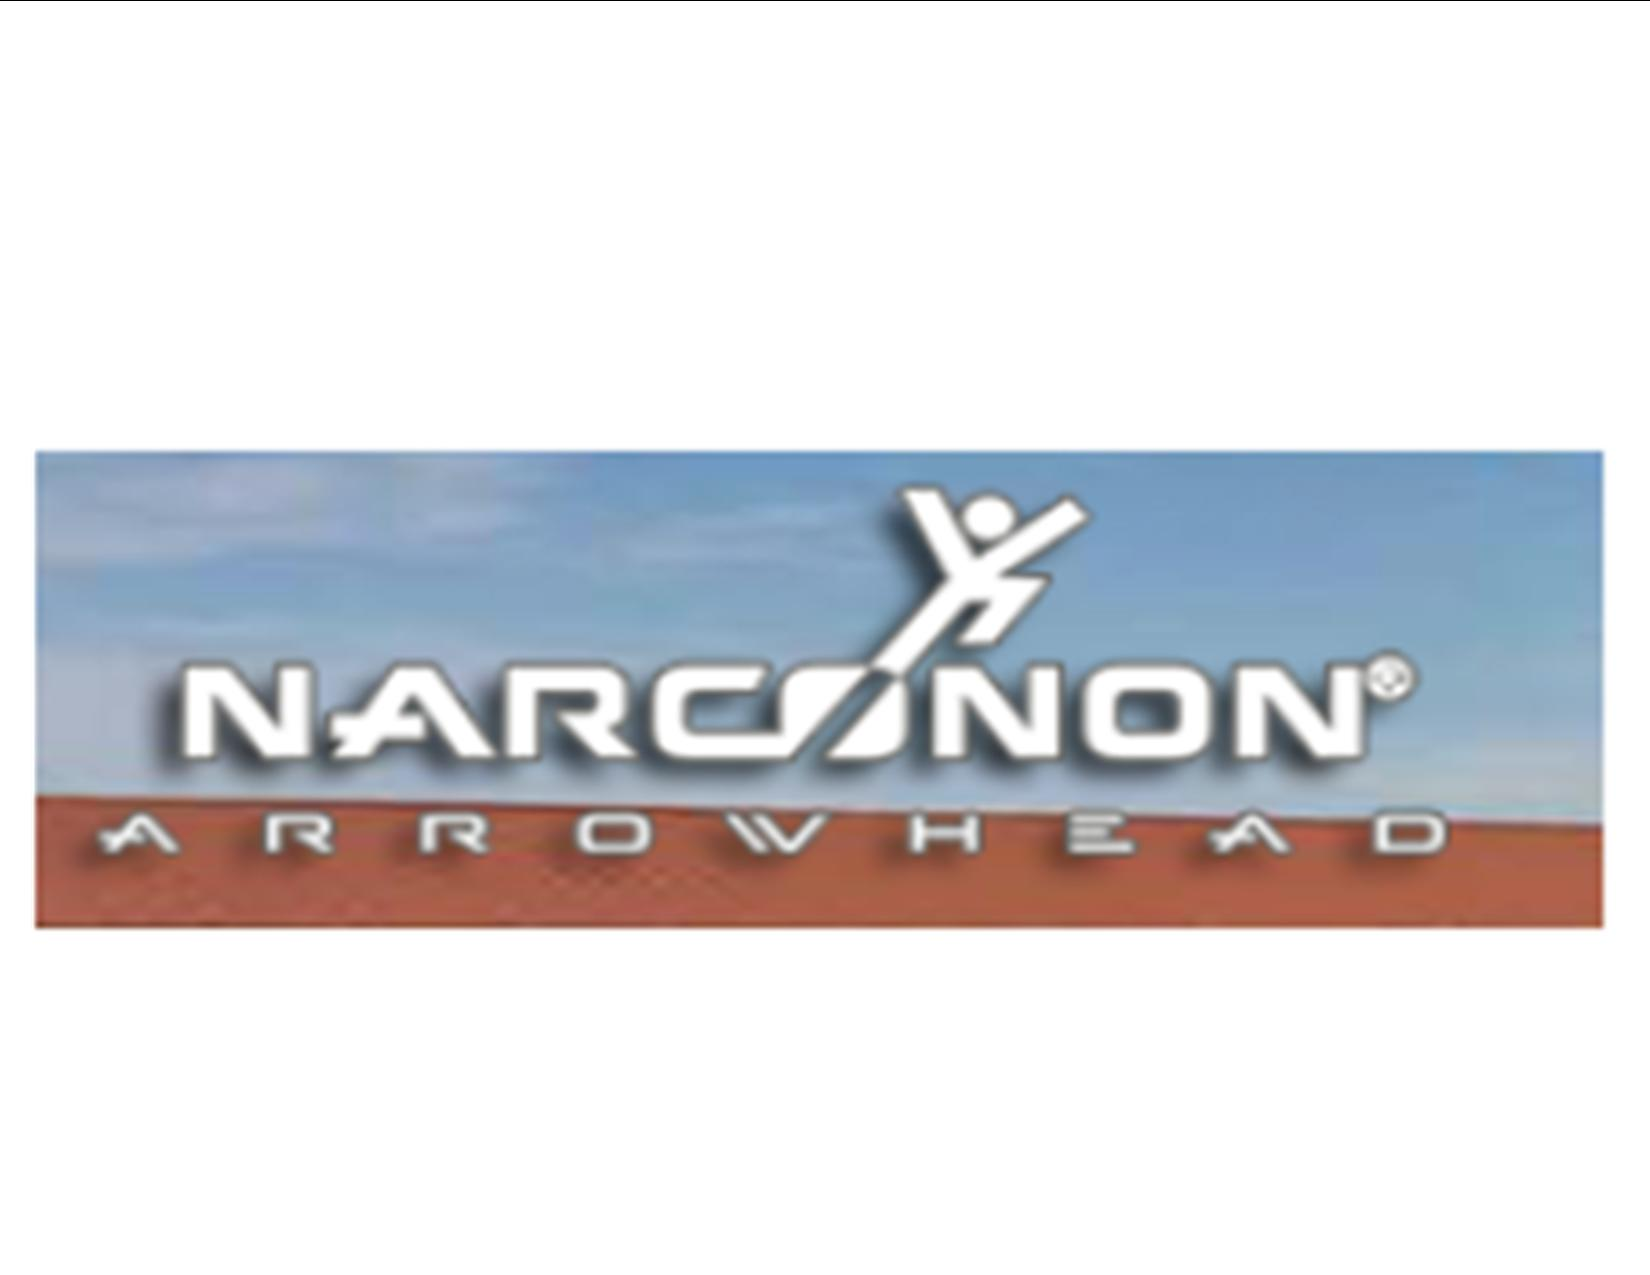 Narconan_Arrowhead_logo1.jpg